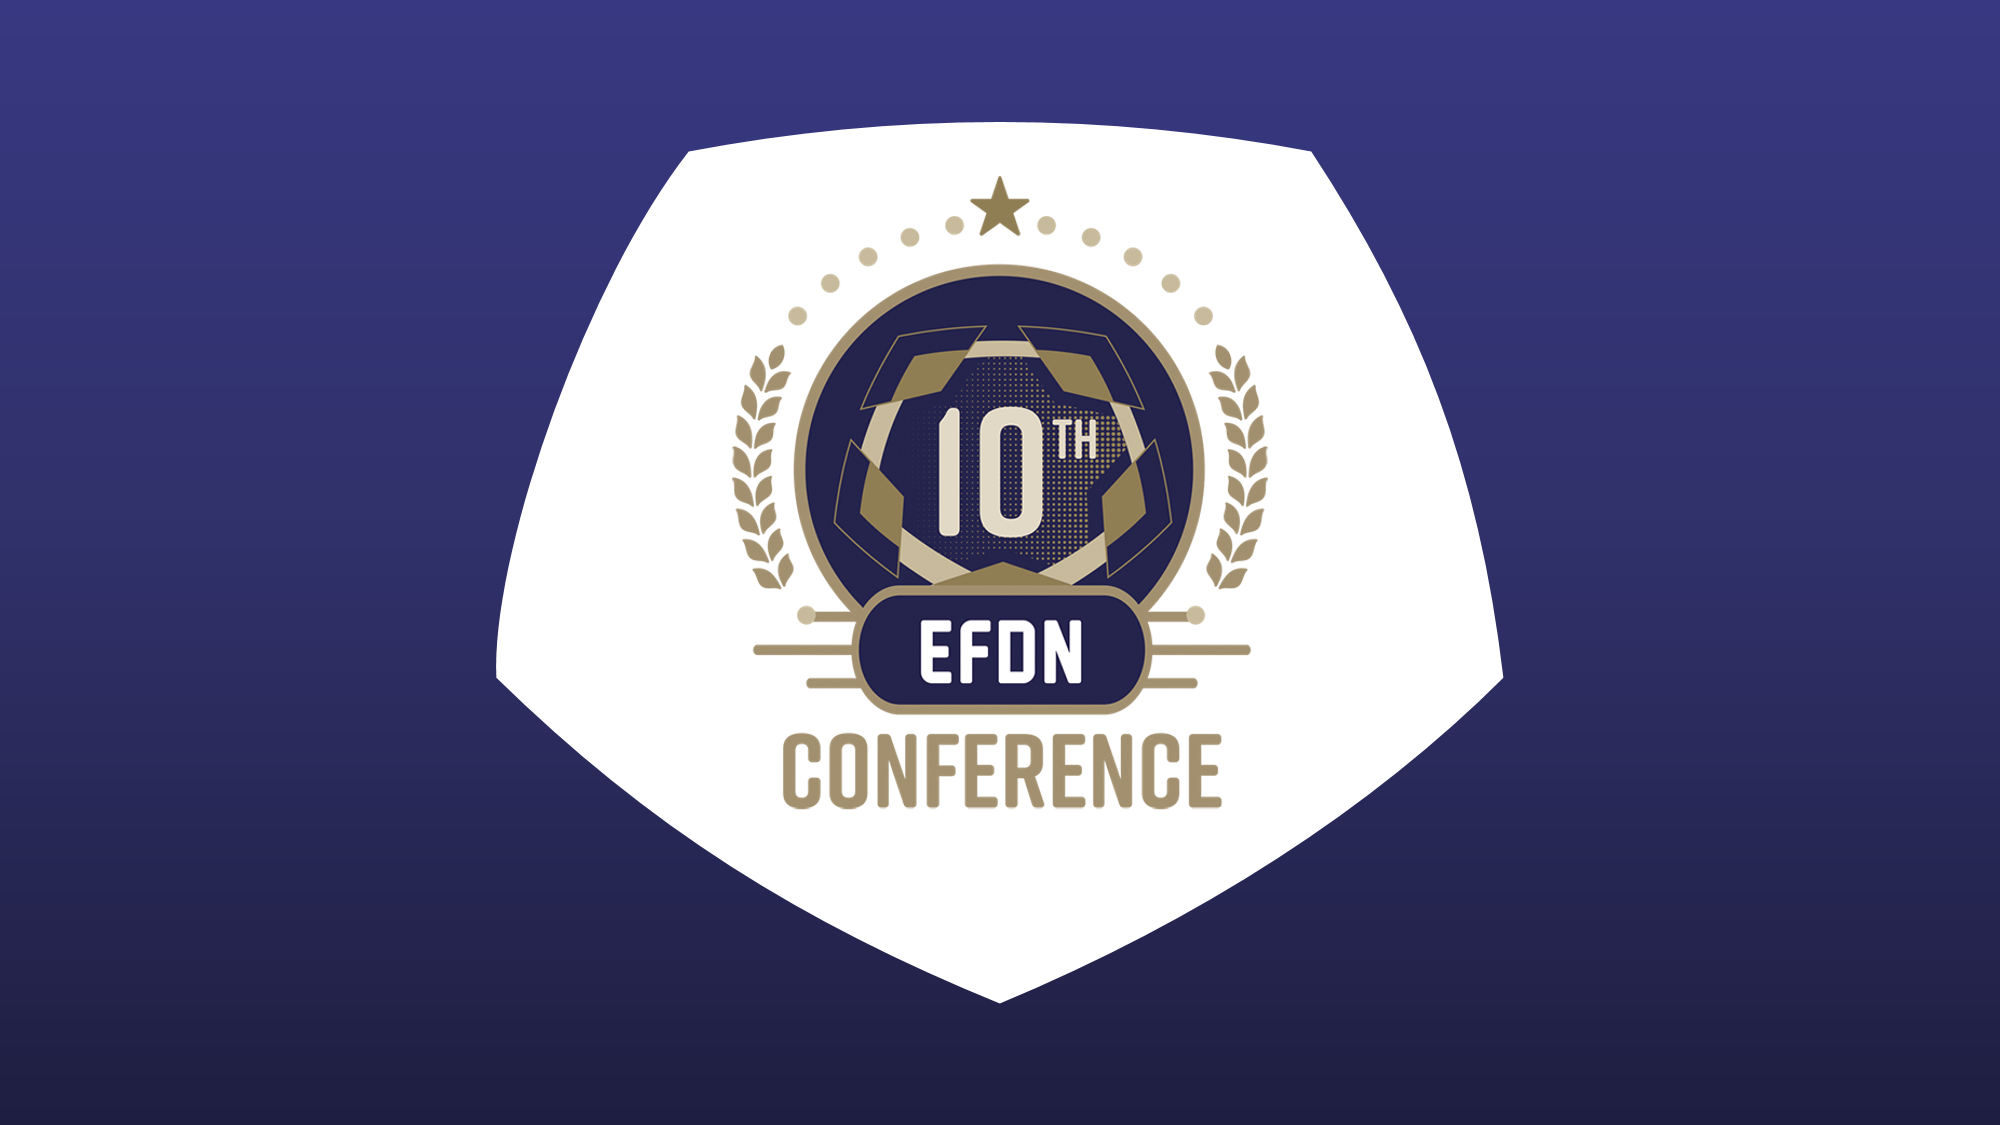 EFDN Conference